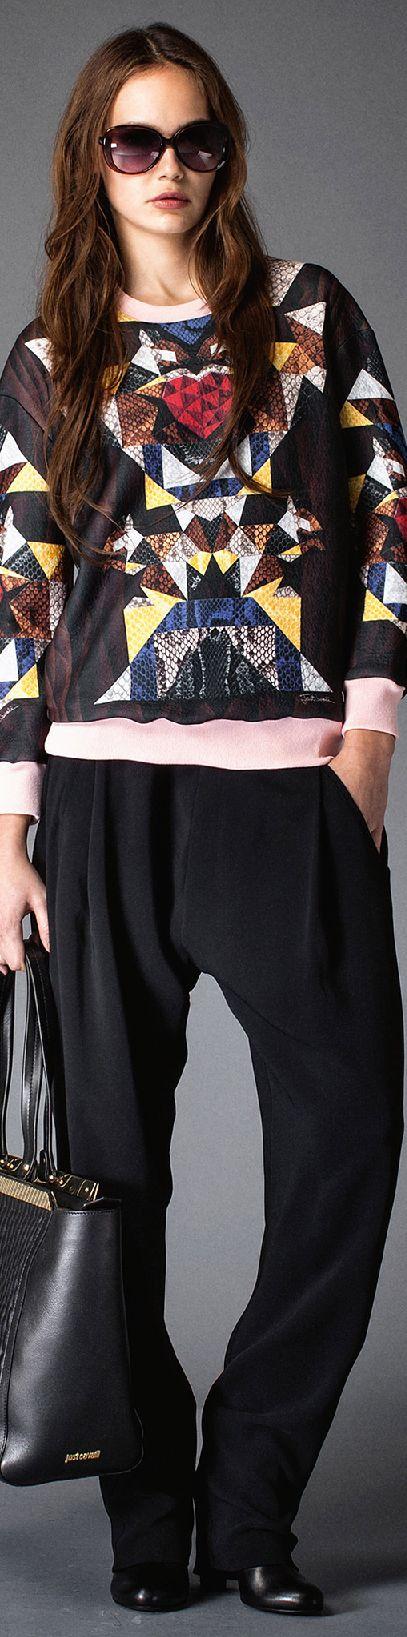 8dcd21e7b166e2641ee6a52ee9e0054c--fall-winter-fashion-fall- Roberto Cavalli Couture  : Just Cavalli Pré-automne 2015